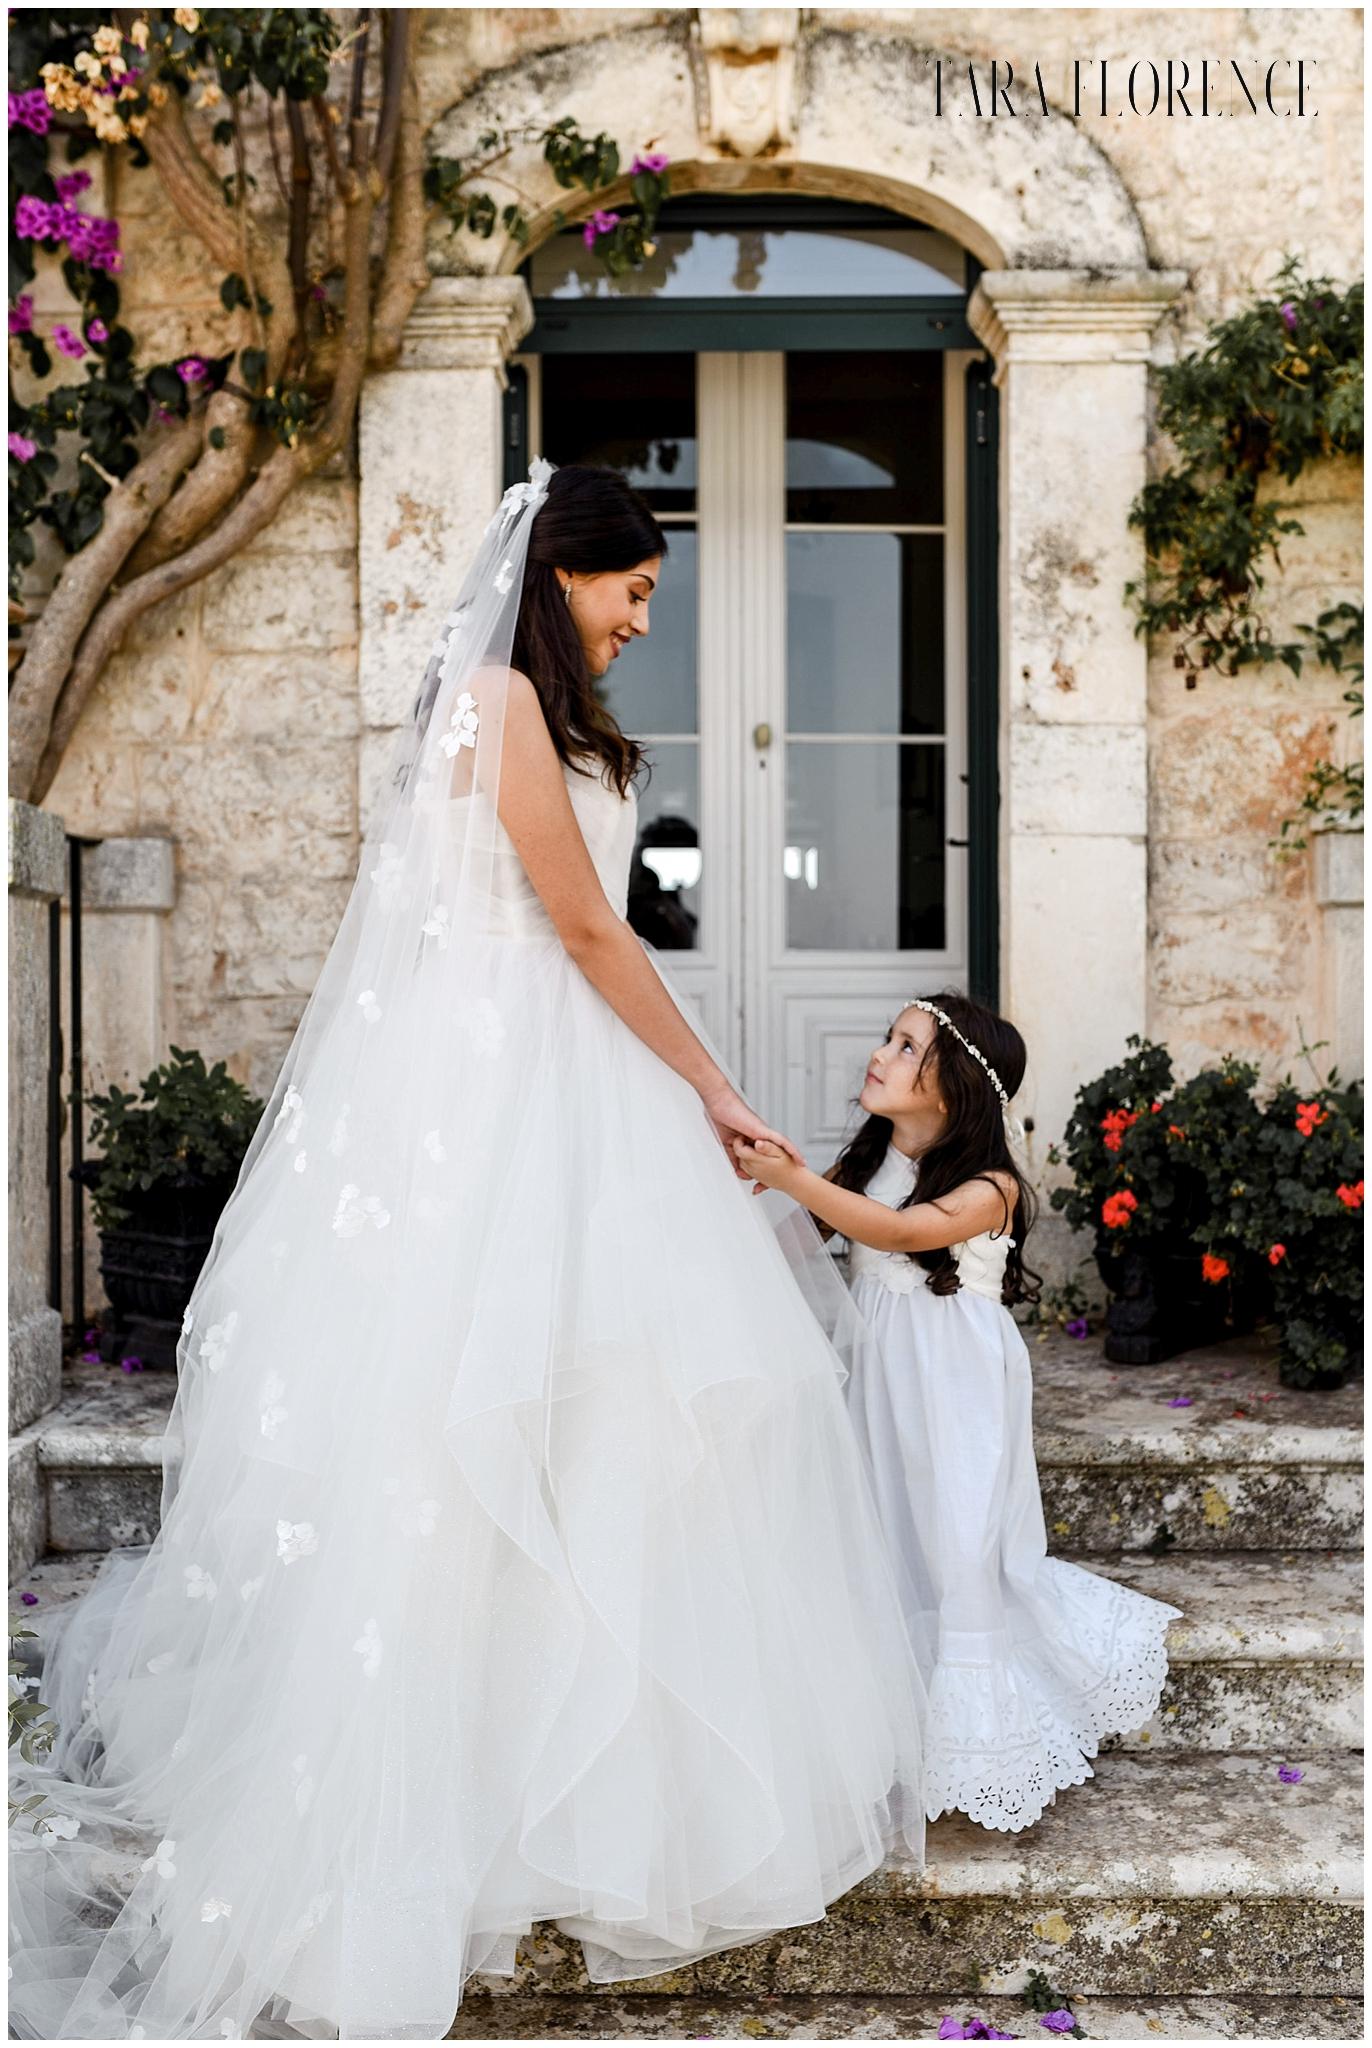 Puglia-Tara-Florence-Bridal-Editorial-138_WEB.jpg